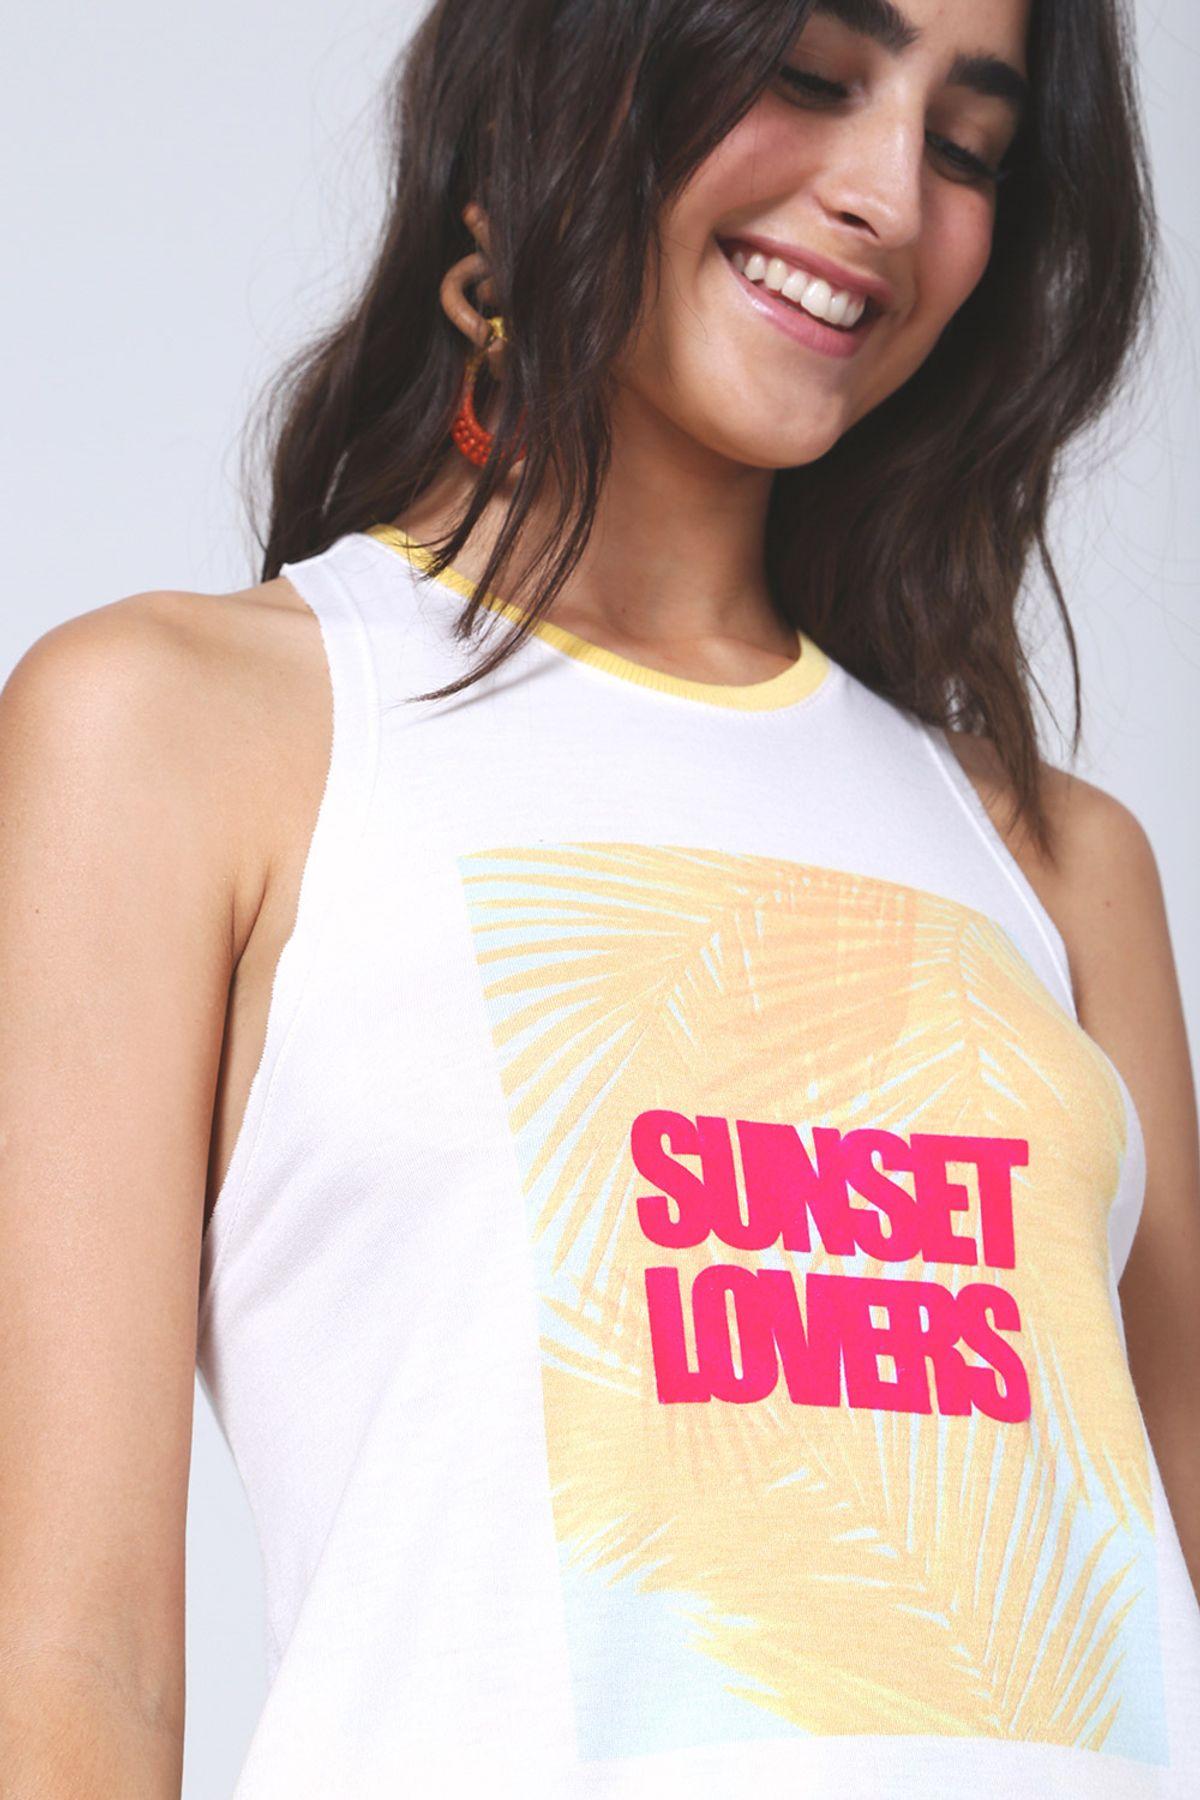 REGATA-SUNSET-LOVERS-020224900001-OH-BOY